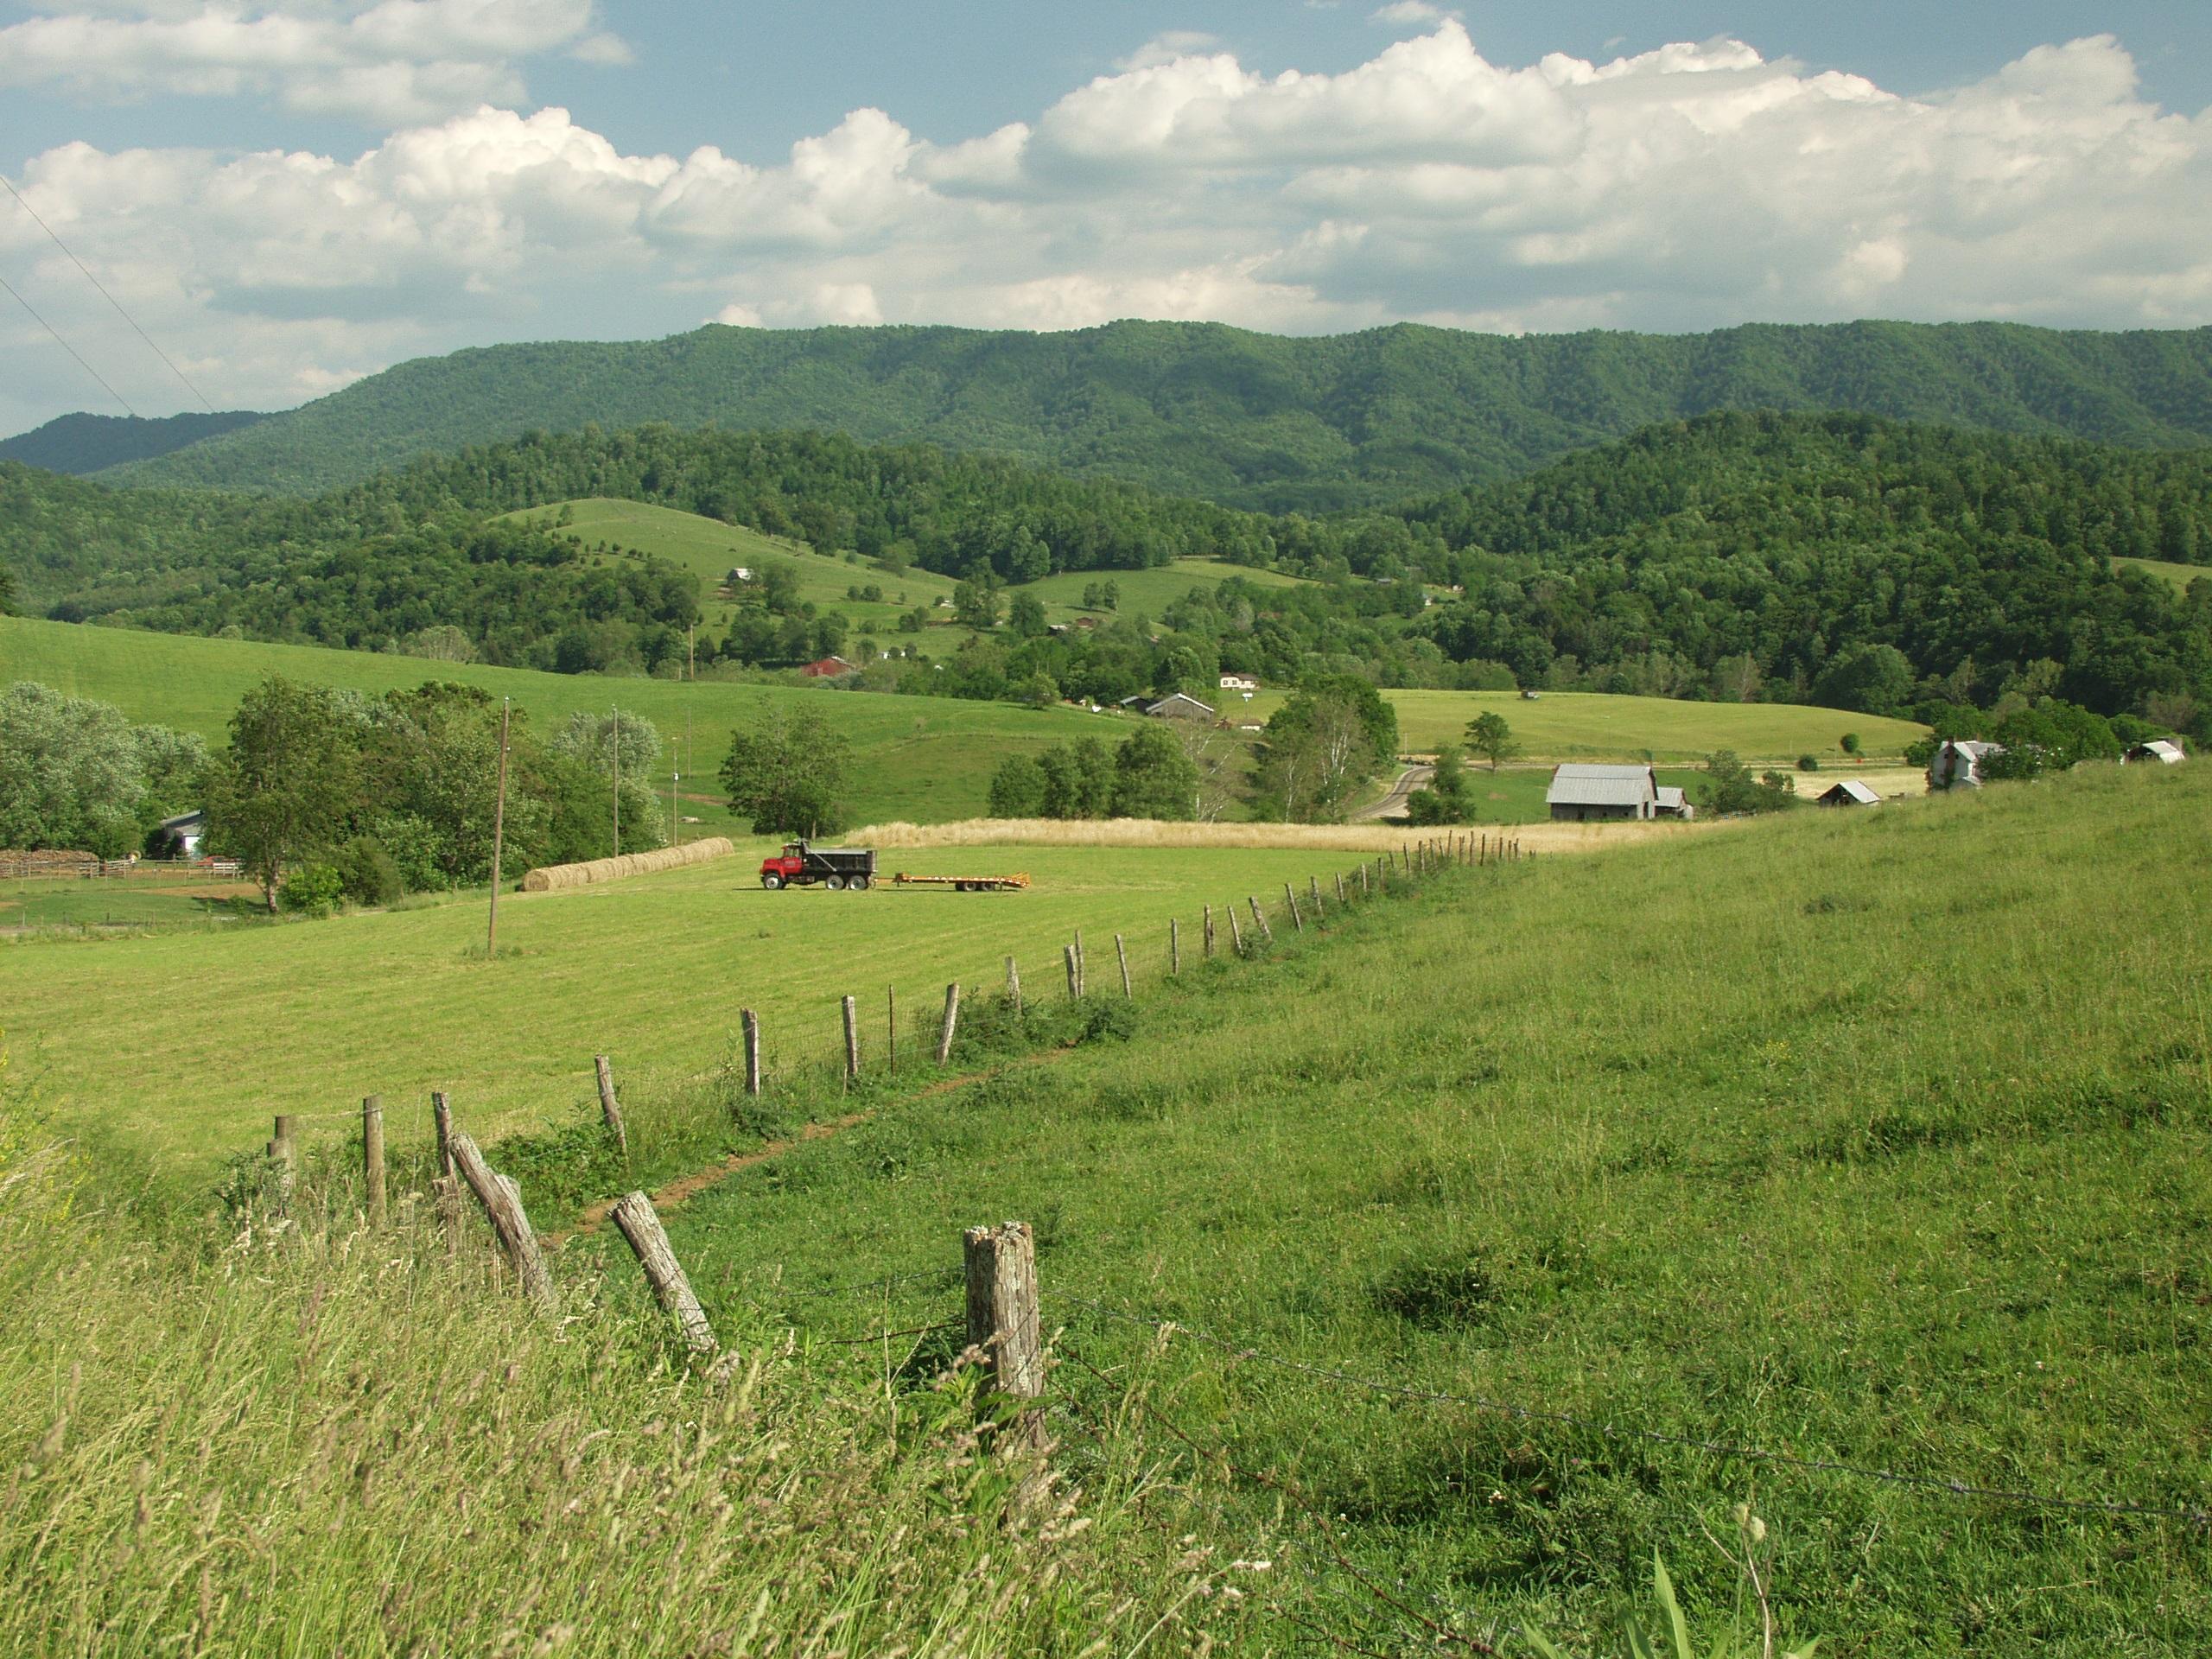 Farm, Smyth County Virginia 02, 2006 vacation